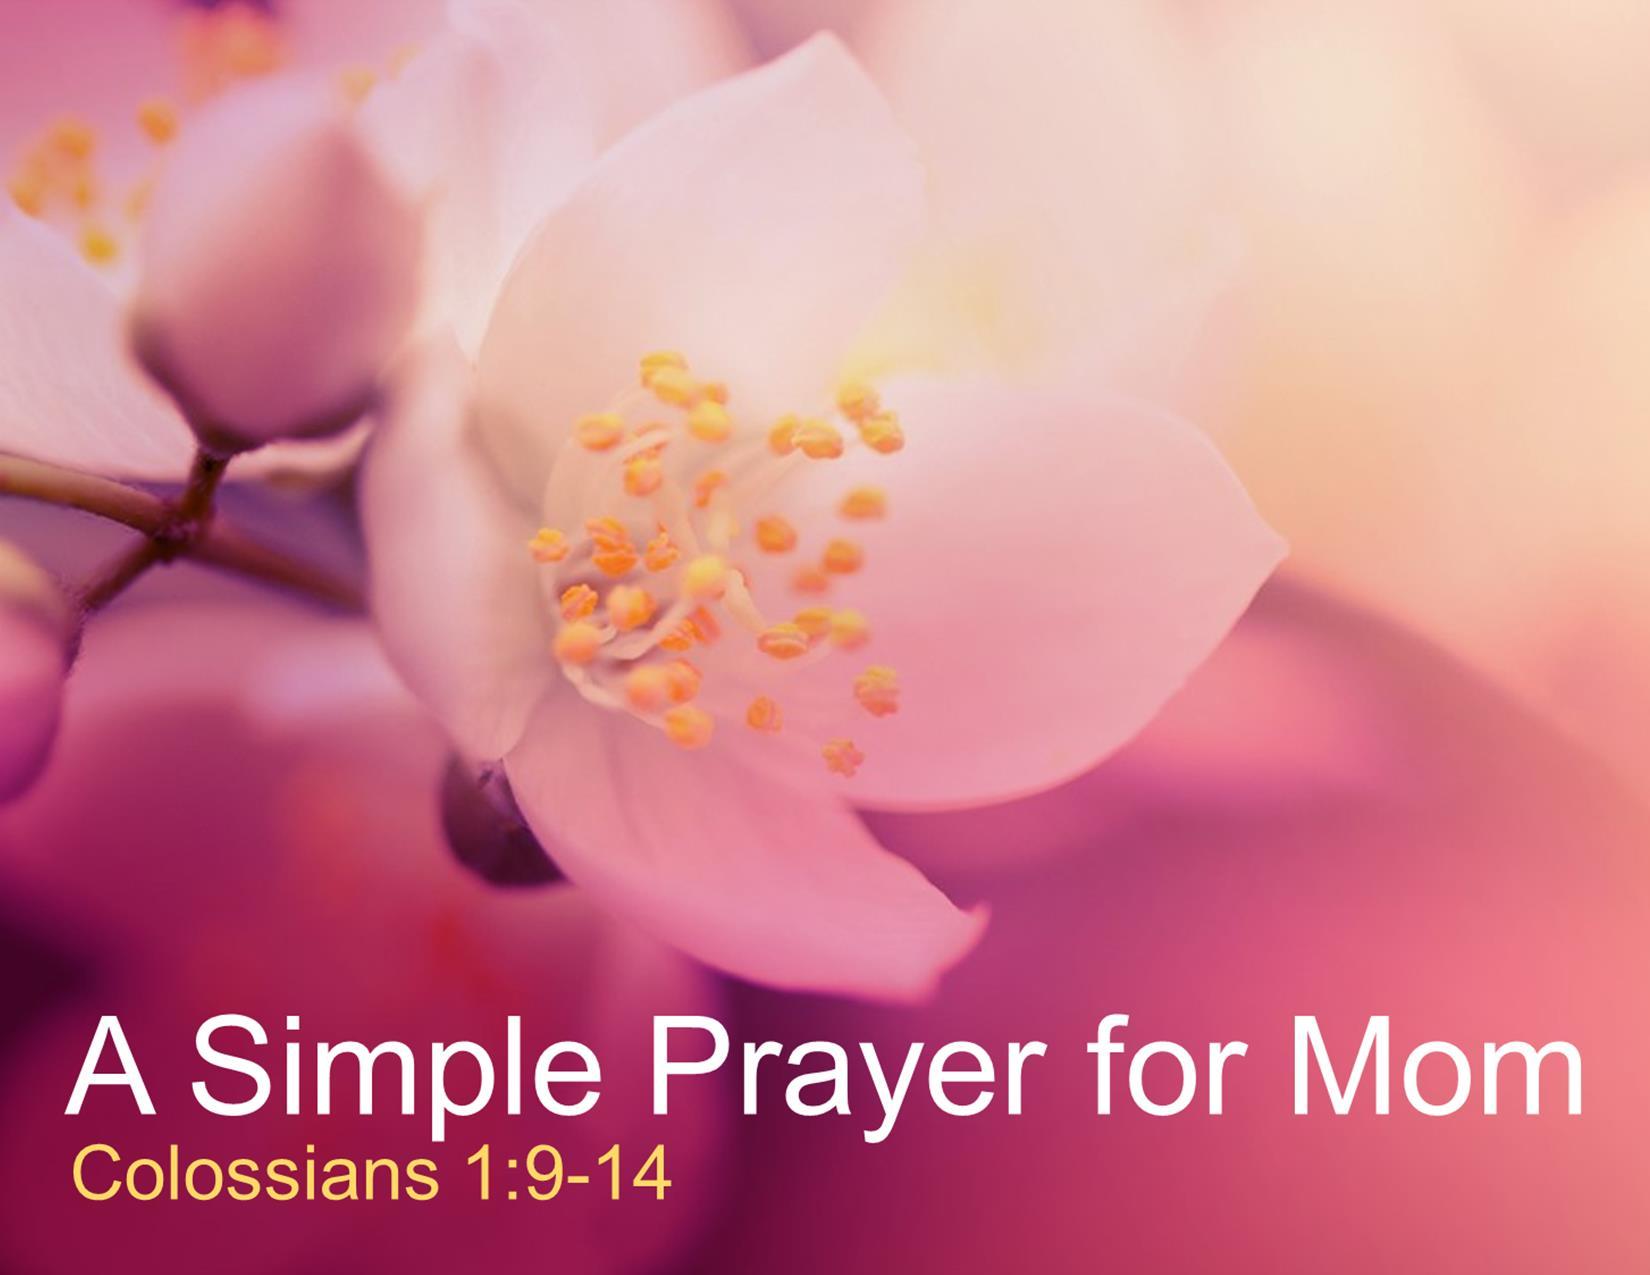 May 8, 2016 ~ A Simple Prayer for Mom, Grandma and Everyone Else (Colossians 1:9-14) ~ Pastor Jason Pilchard